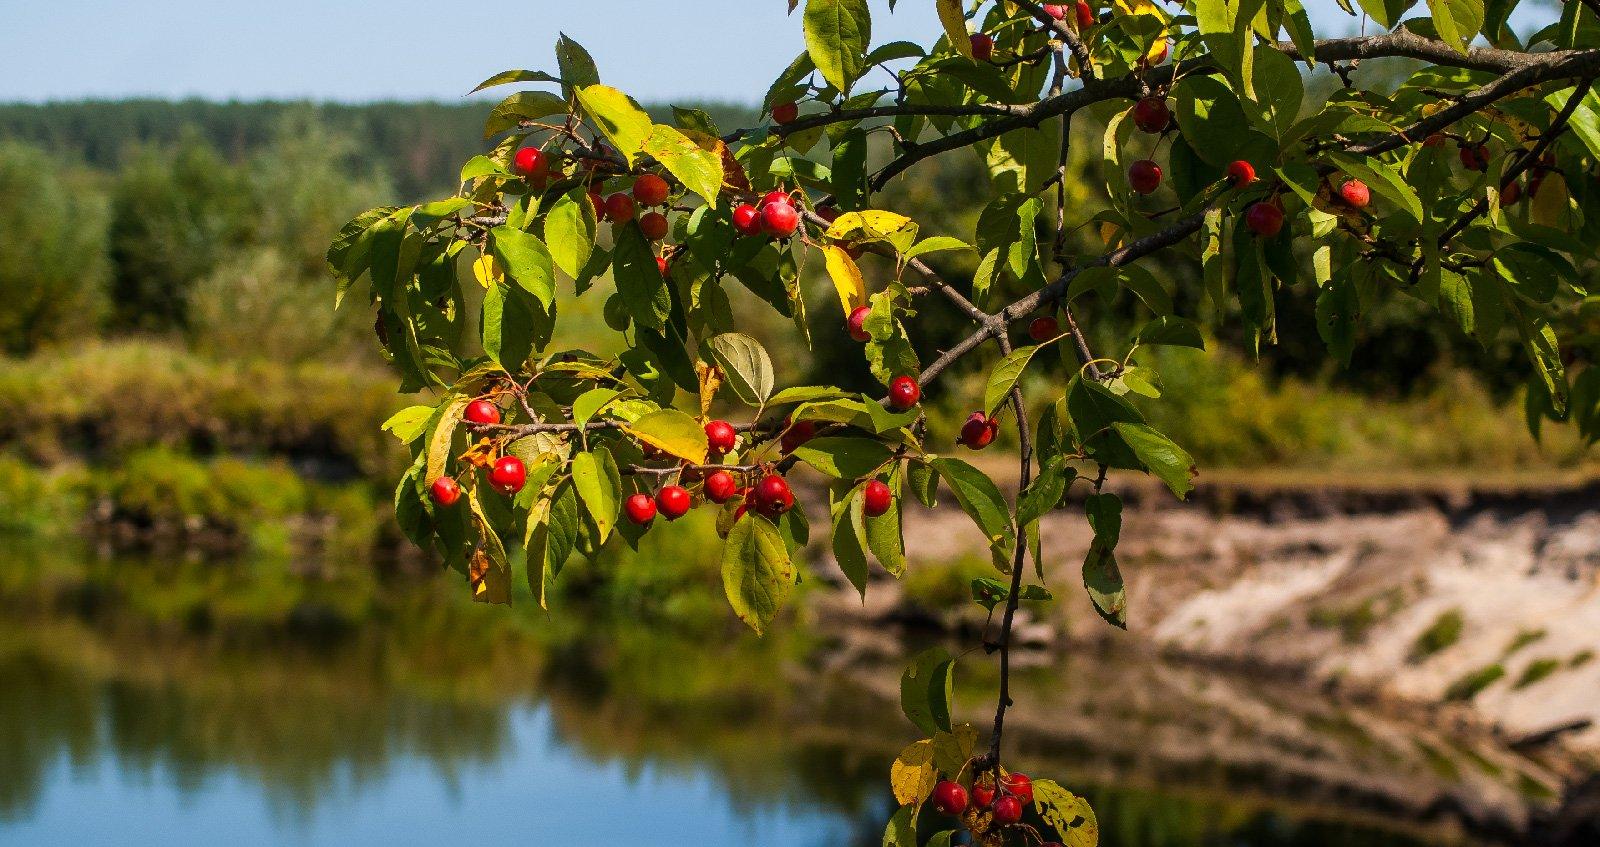 Еще немножко яблони напоследок